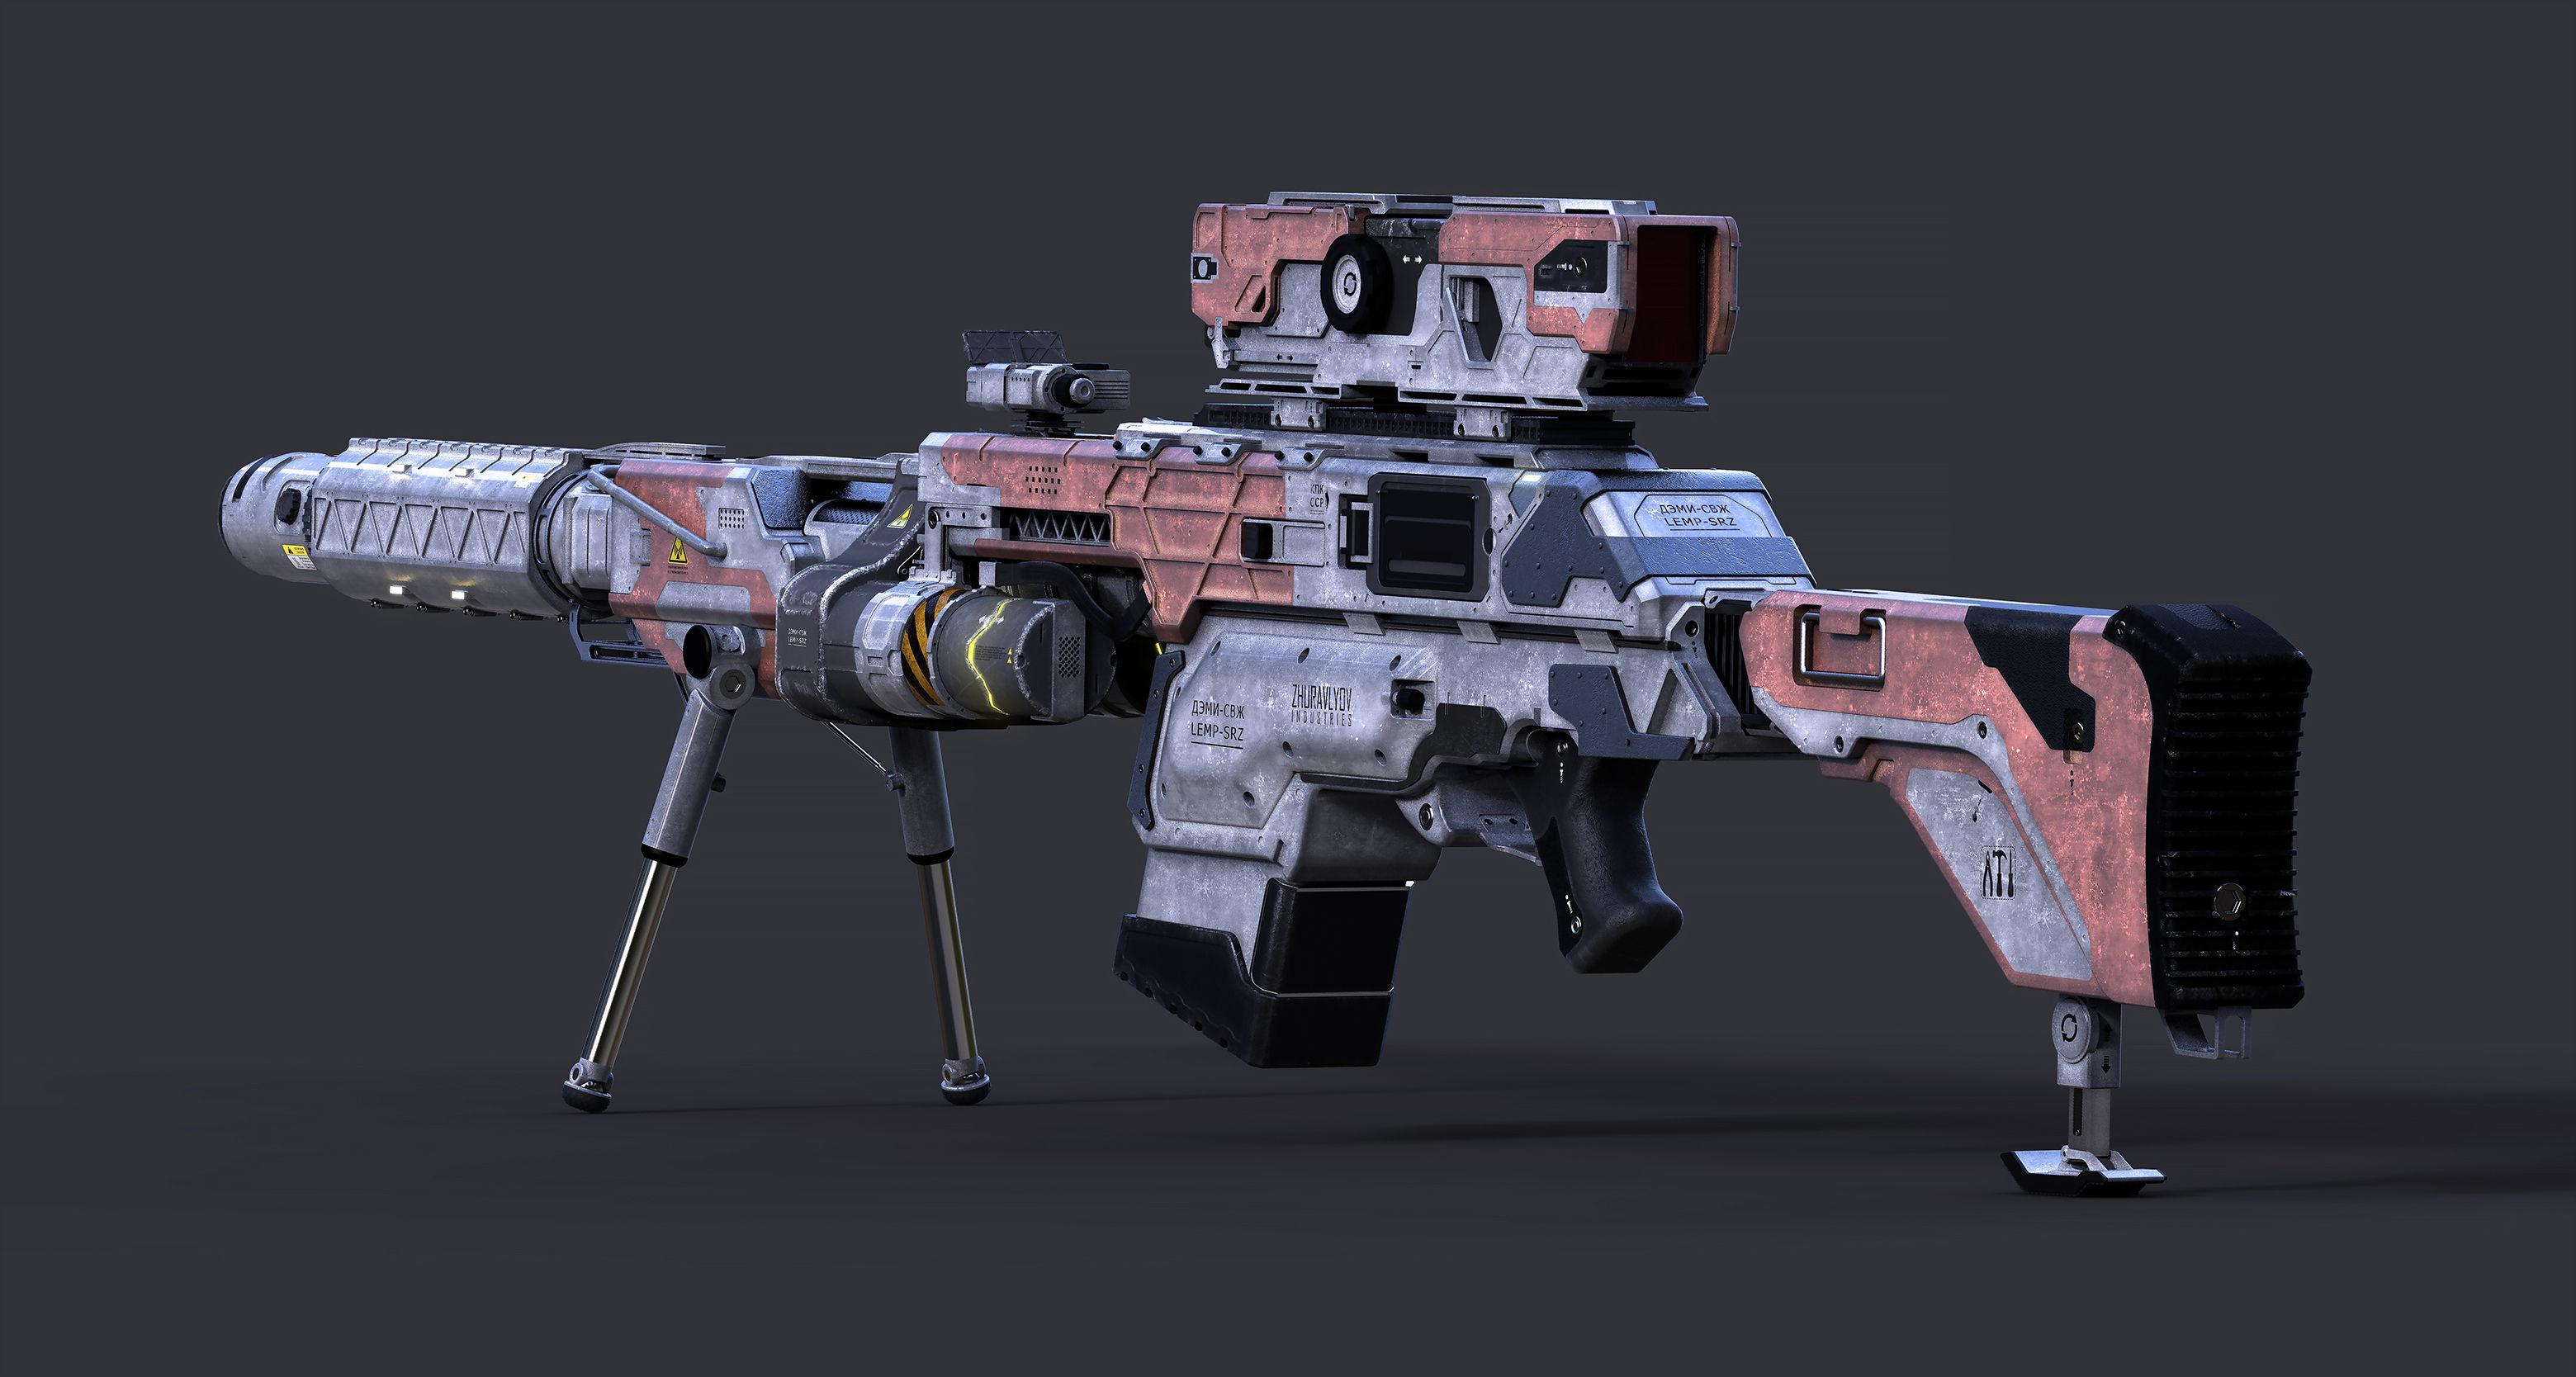 Srz-3k-1-3500-3500